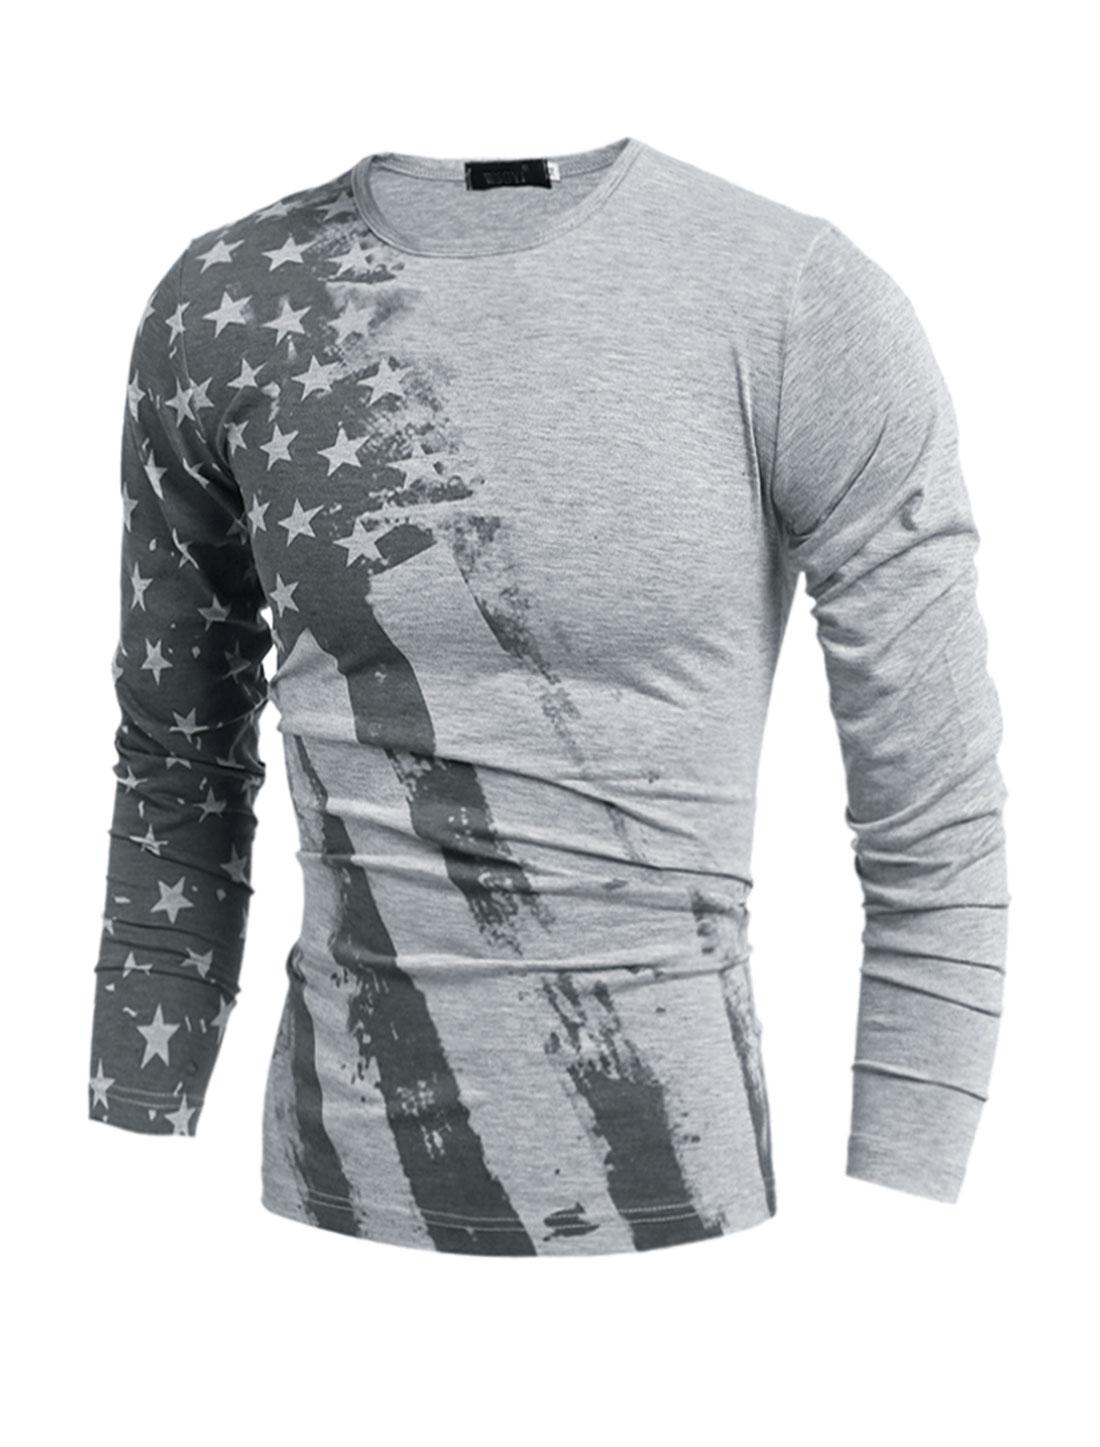 Man Slim Fit Long Sleeves Stars Striped T-Shirt Gray S